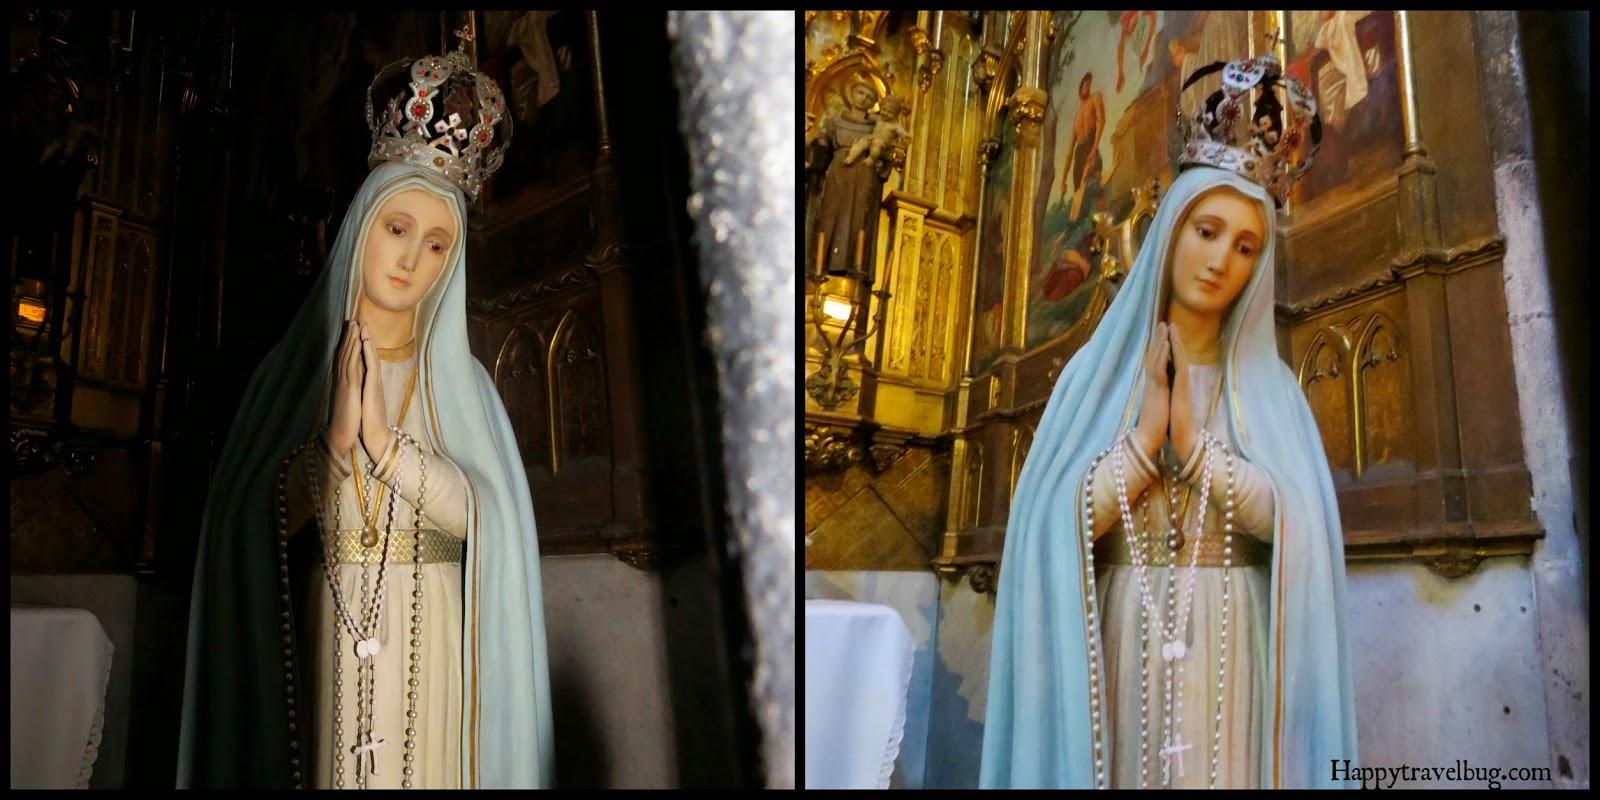 Statue of Mary, mother of Jesus in The Basilica Santa Maria del Pi